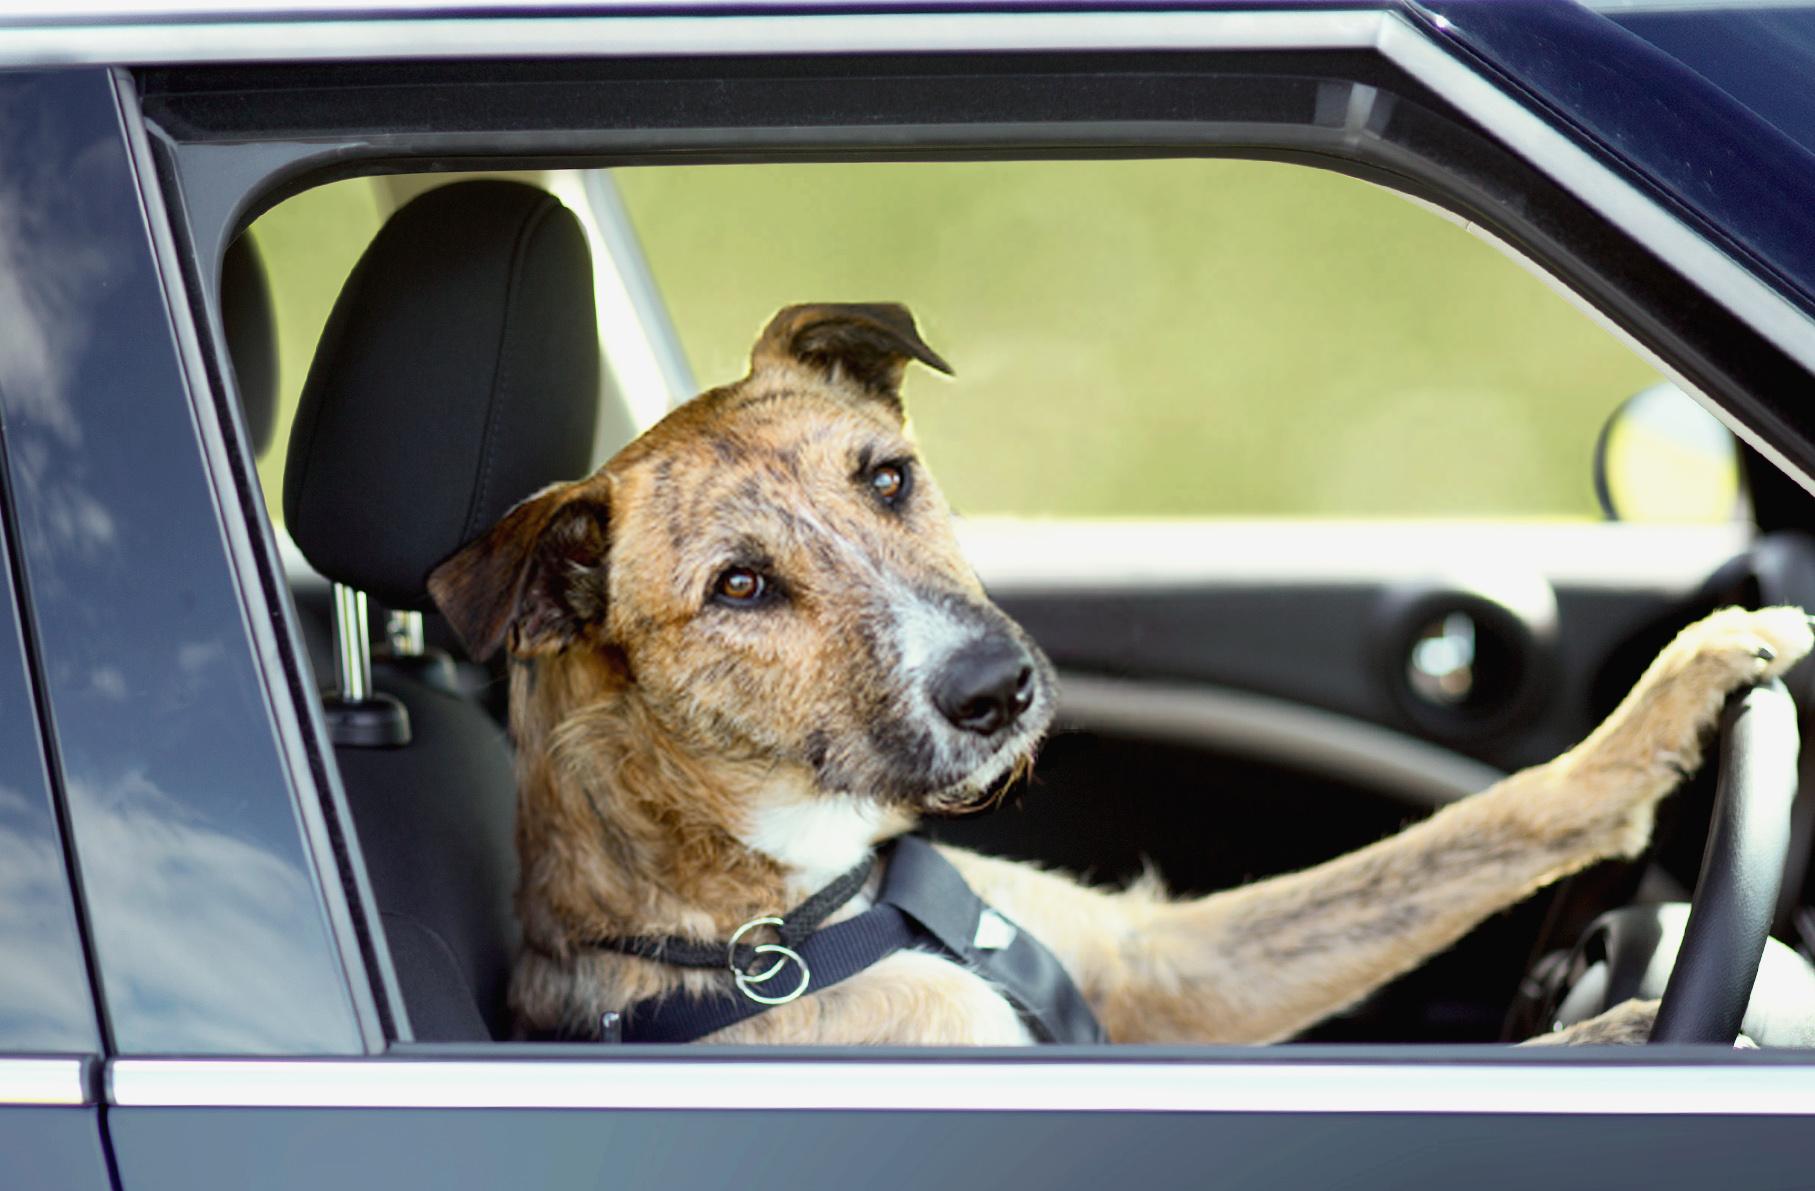 Driving_dogs_www.pixanews.com_